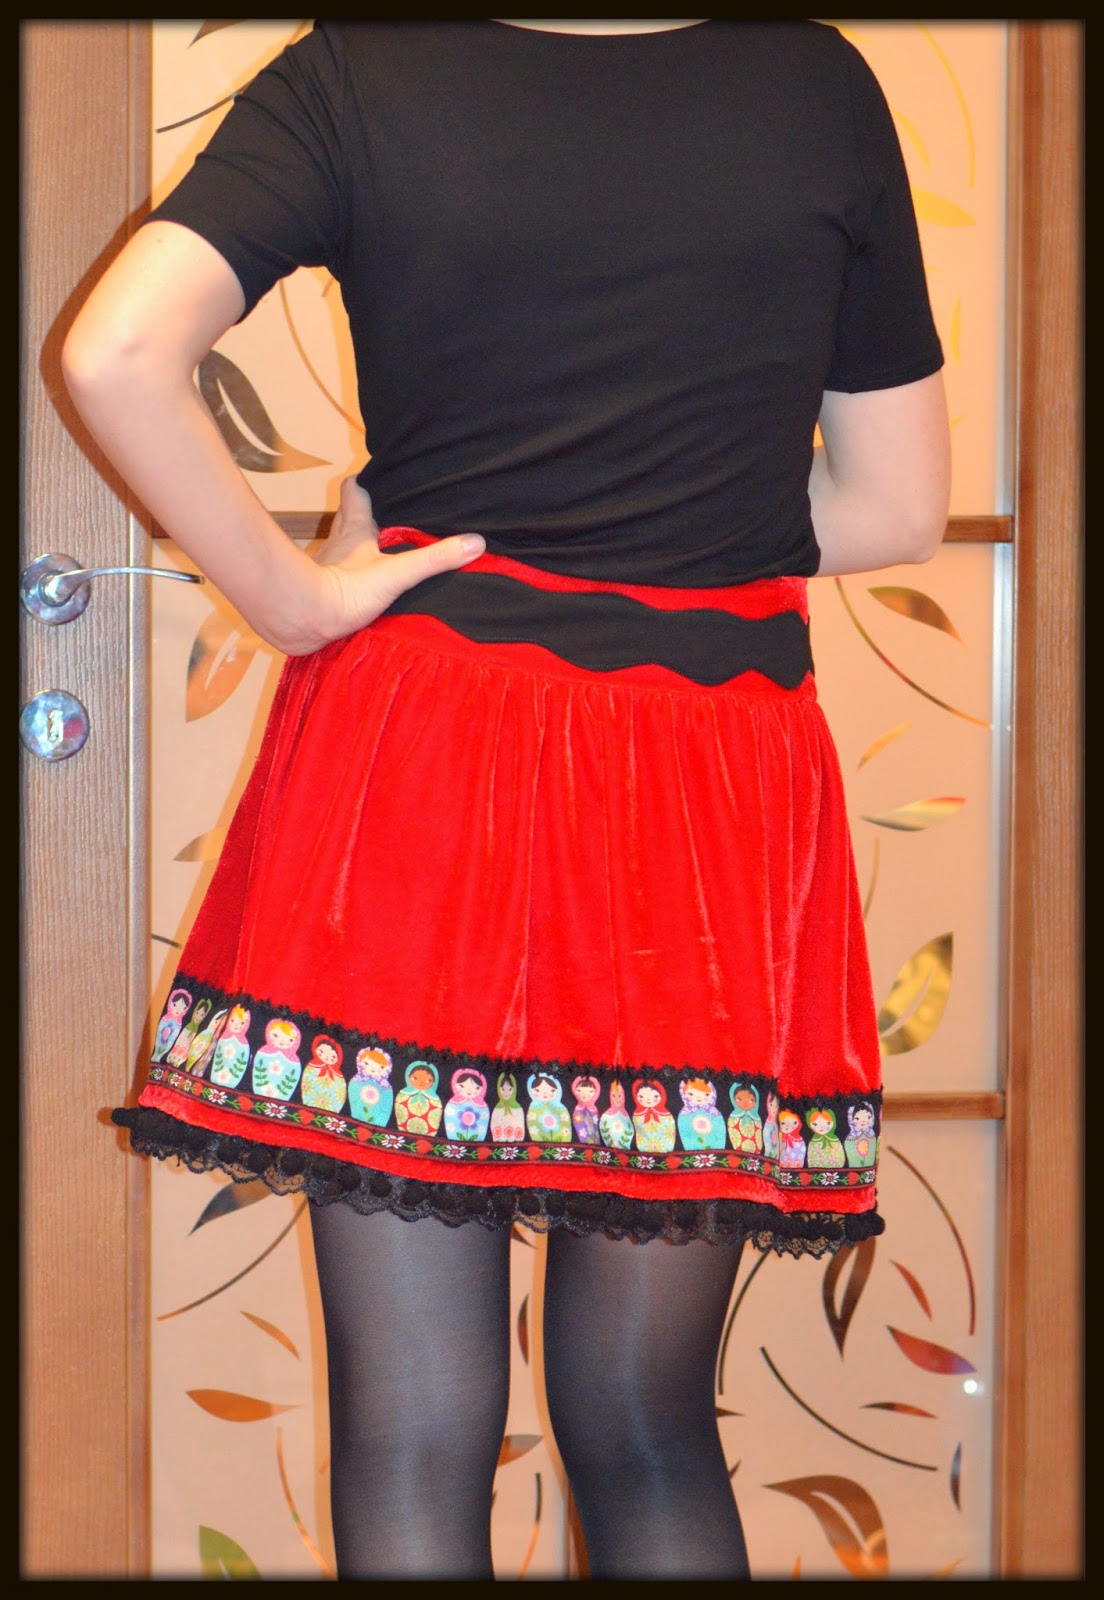 lace tape, matryoshka doll, pom poms tape, red velvet, ribbons applique, skirt, lace hem, decorated waistband